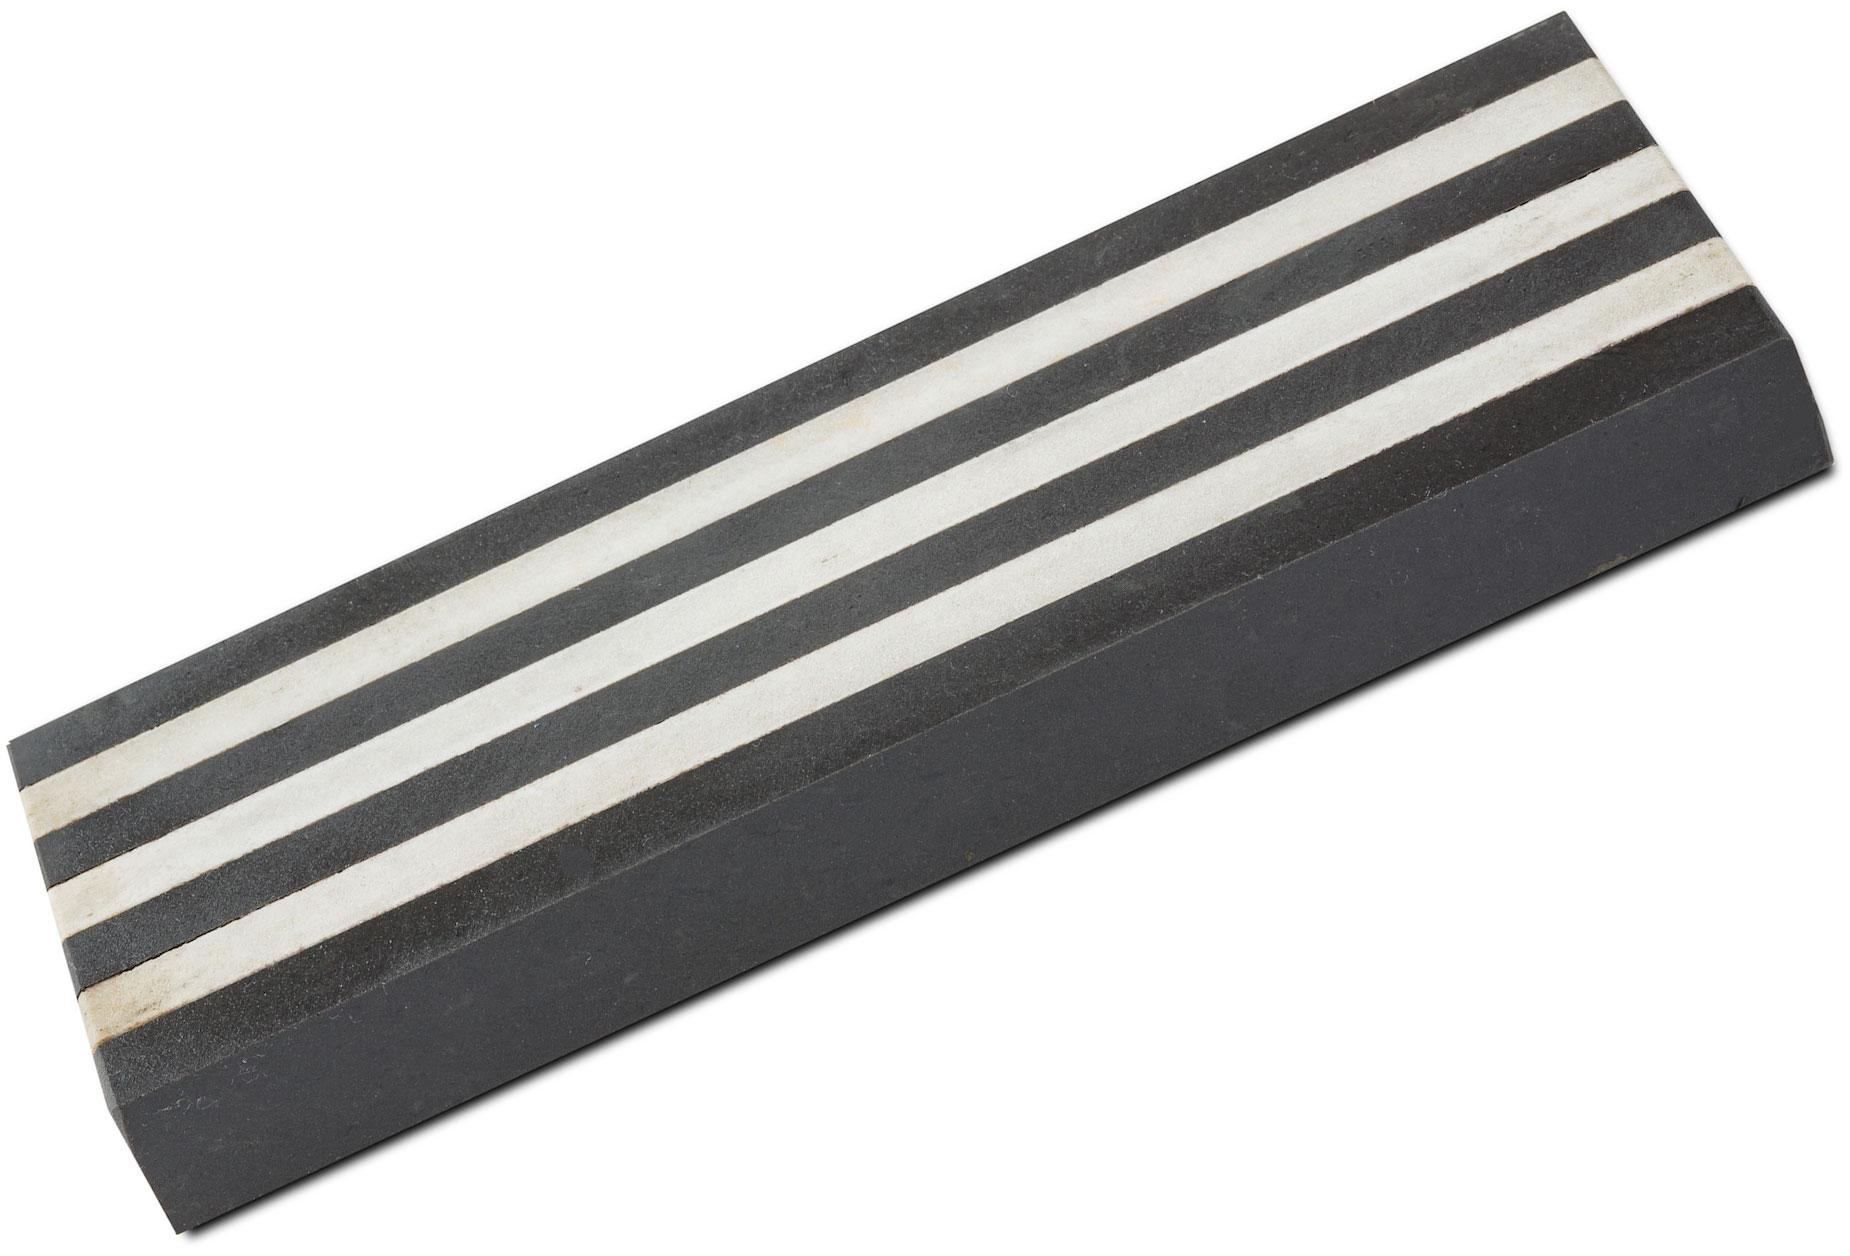 Hall Sharpening Stones 30326 Soft/Dunston Black Arkansas 8 inch Vulcan Stone in Wooden Box